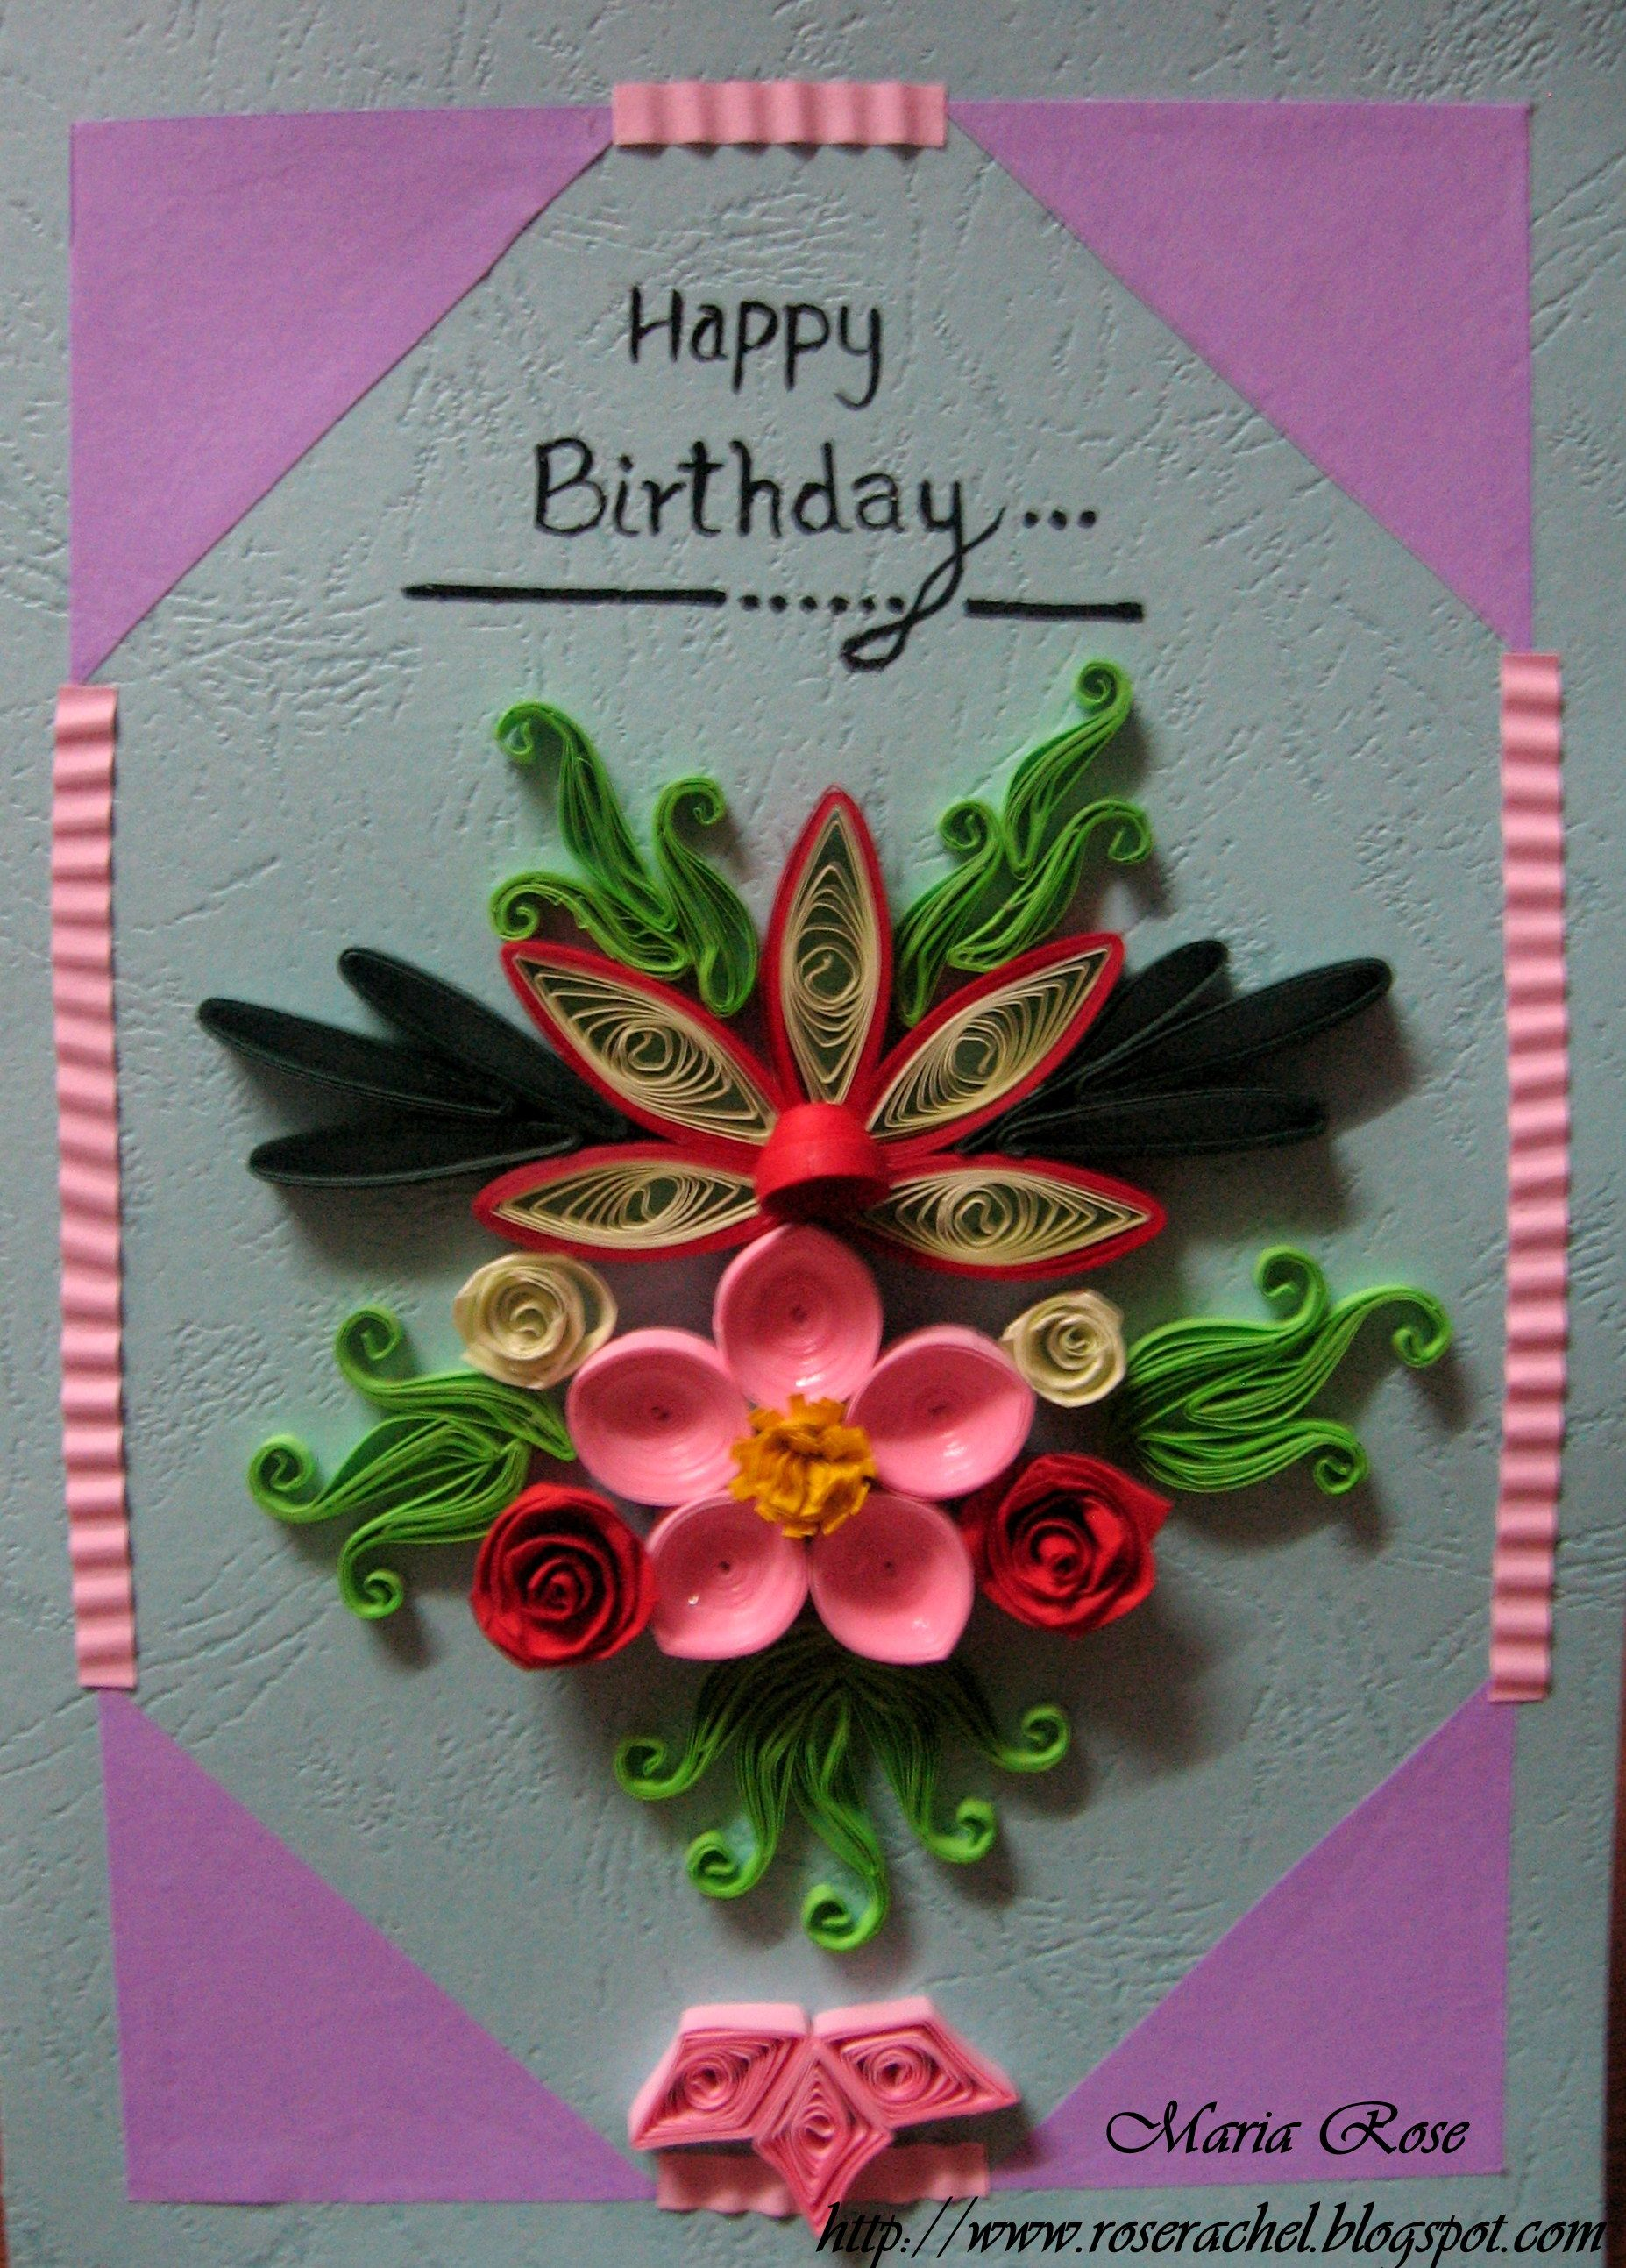 Quilled Birthday Card By Pinterest Com Rosyrachel1